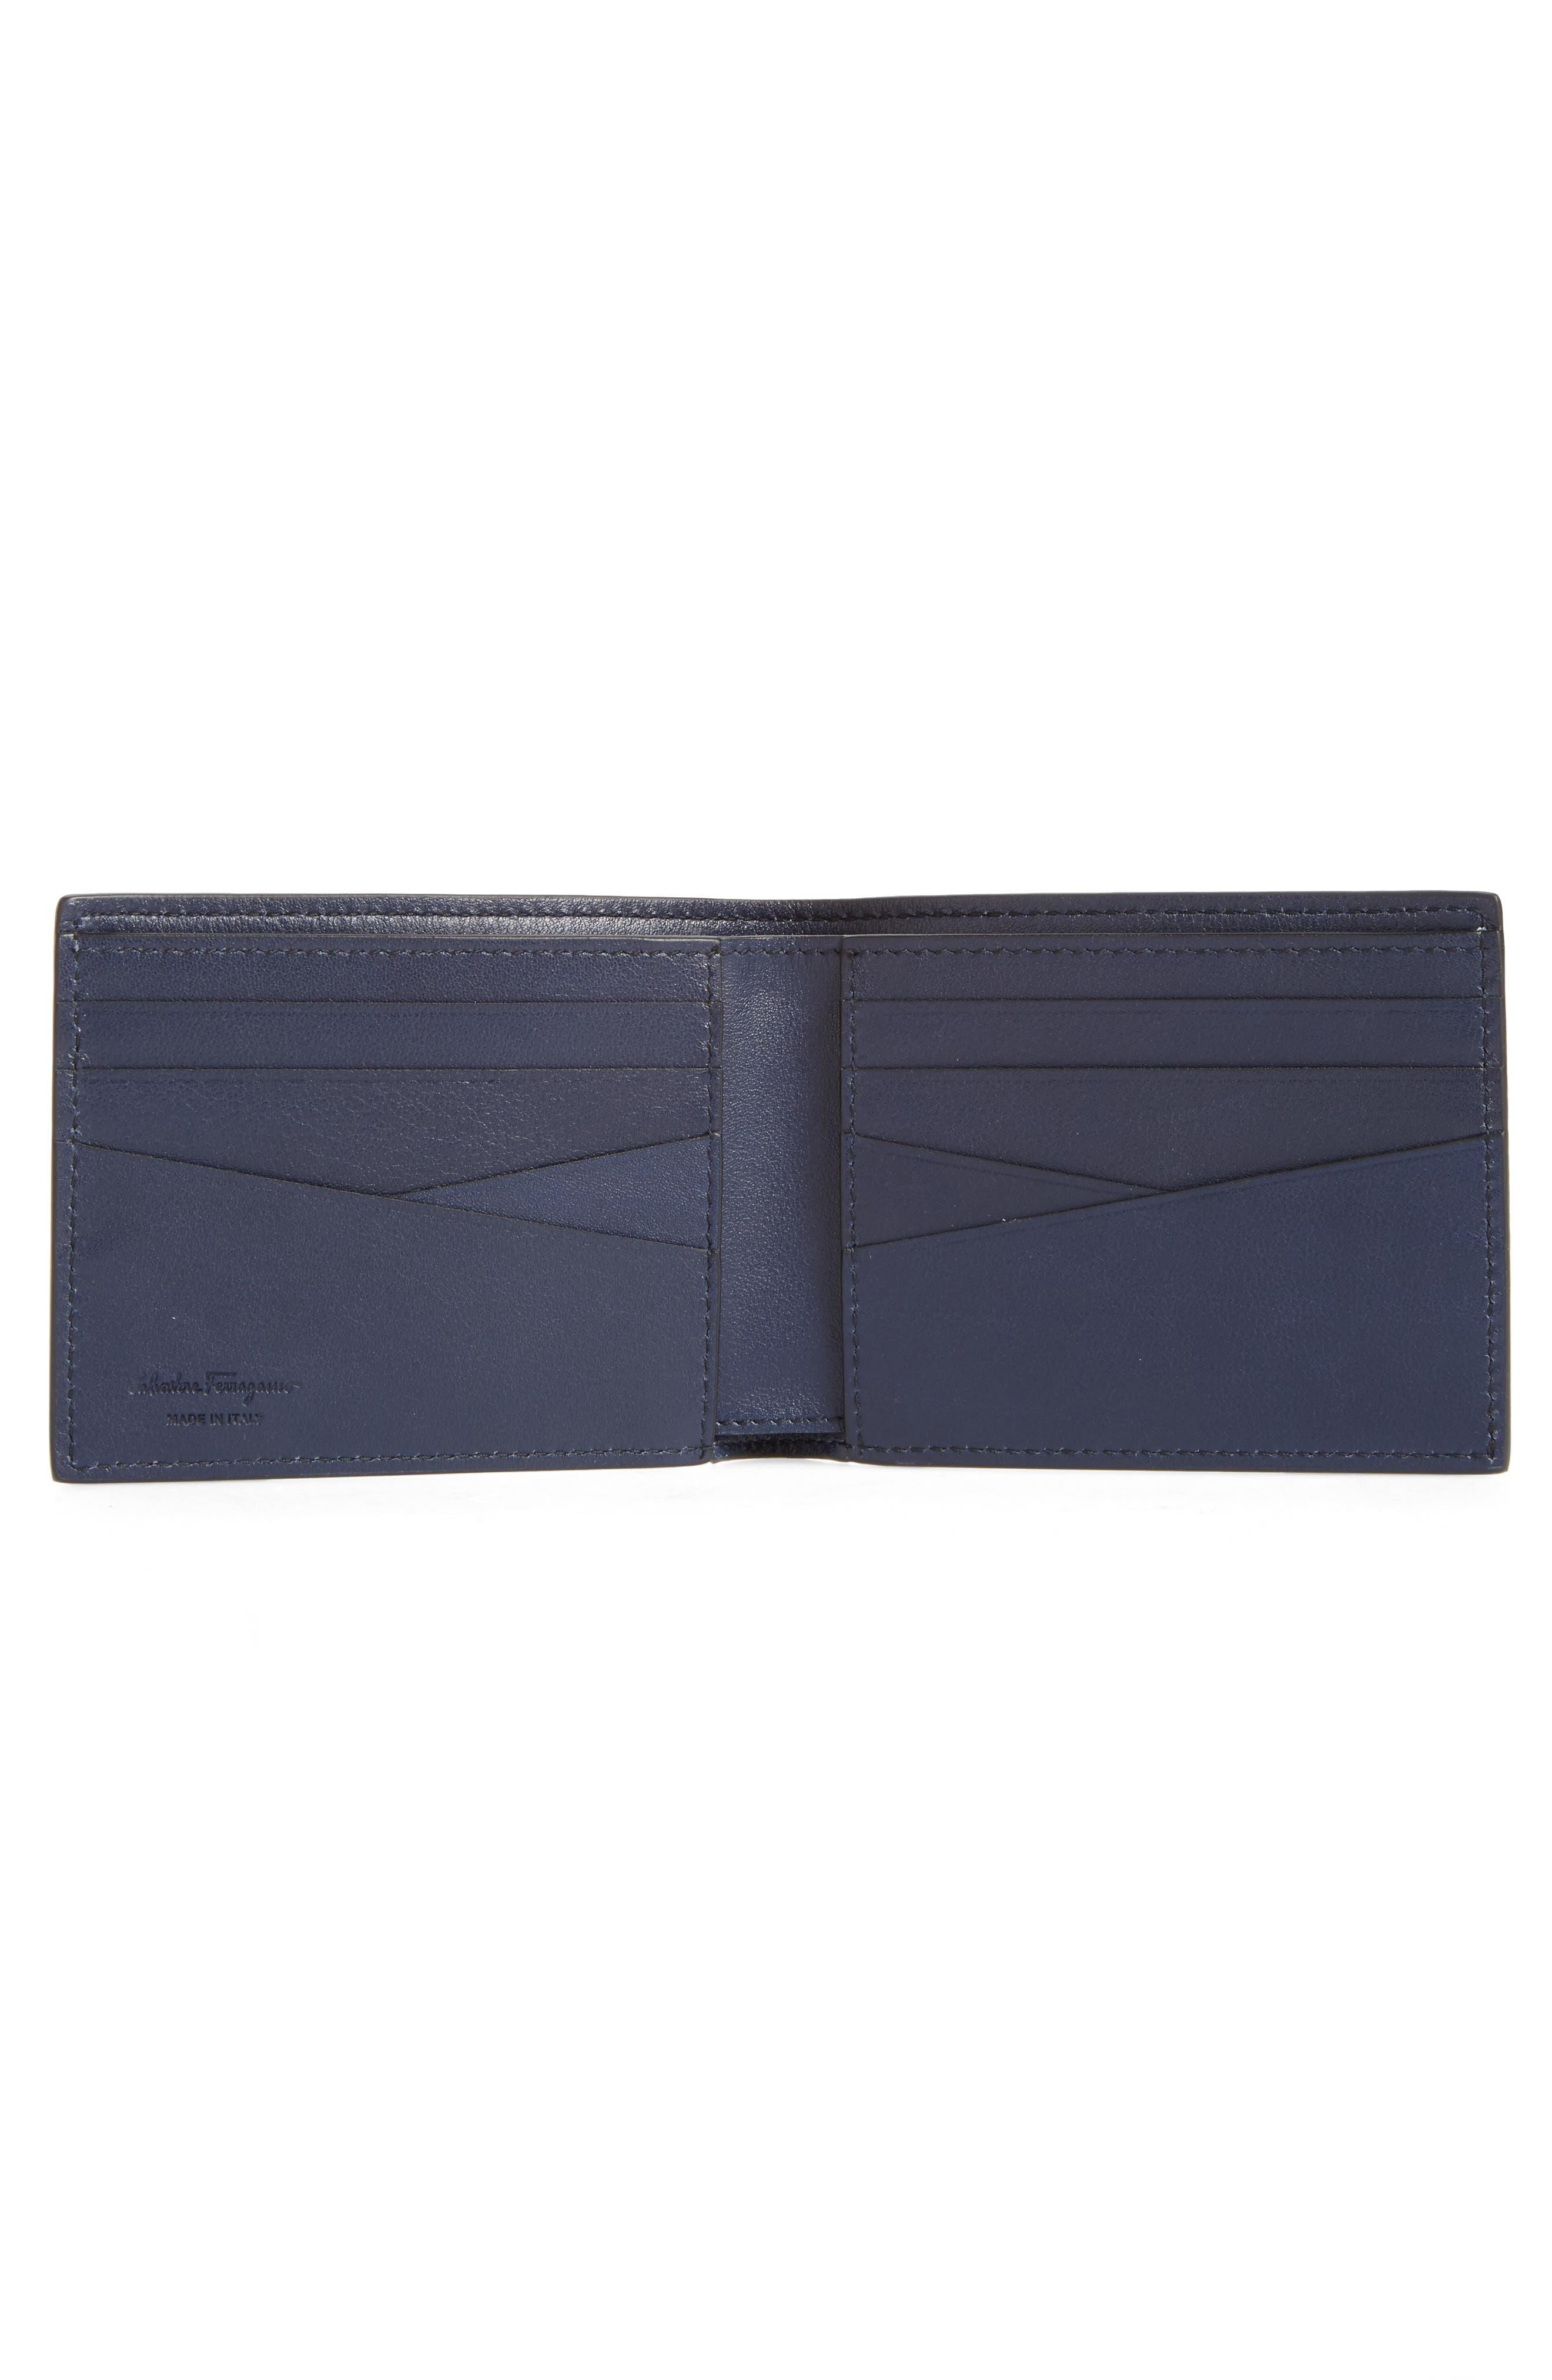 Firenze Glow Calfskin Leather Bifold Wallet,                             Alternate thumbnail 2, color,